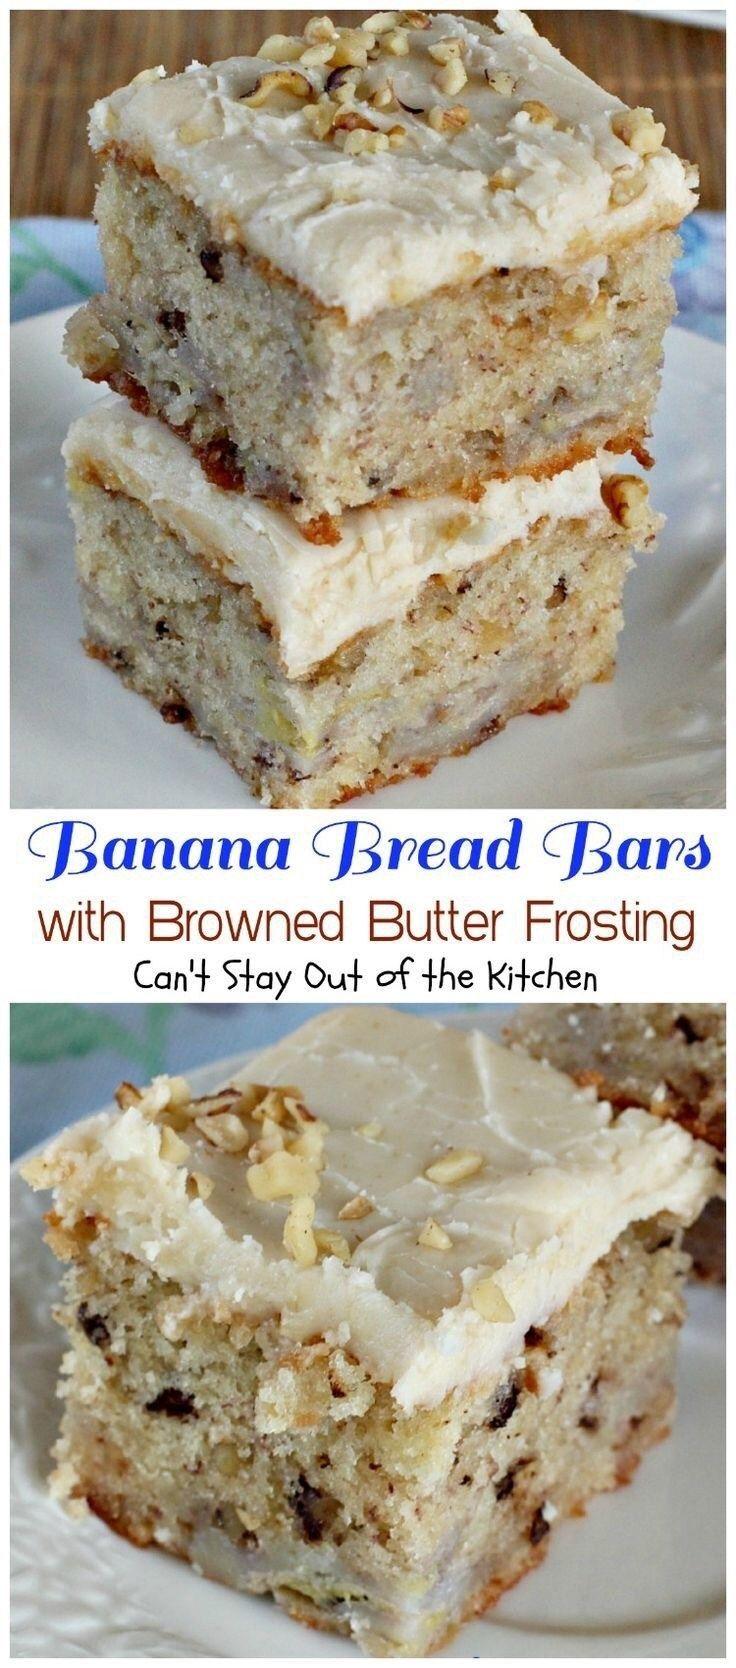 30 Easy Banana Desserts - Karluci #bananadessertrecipes